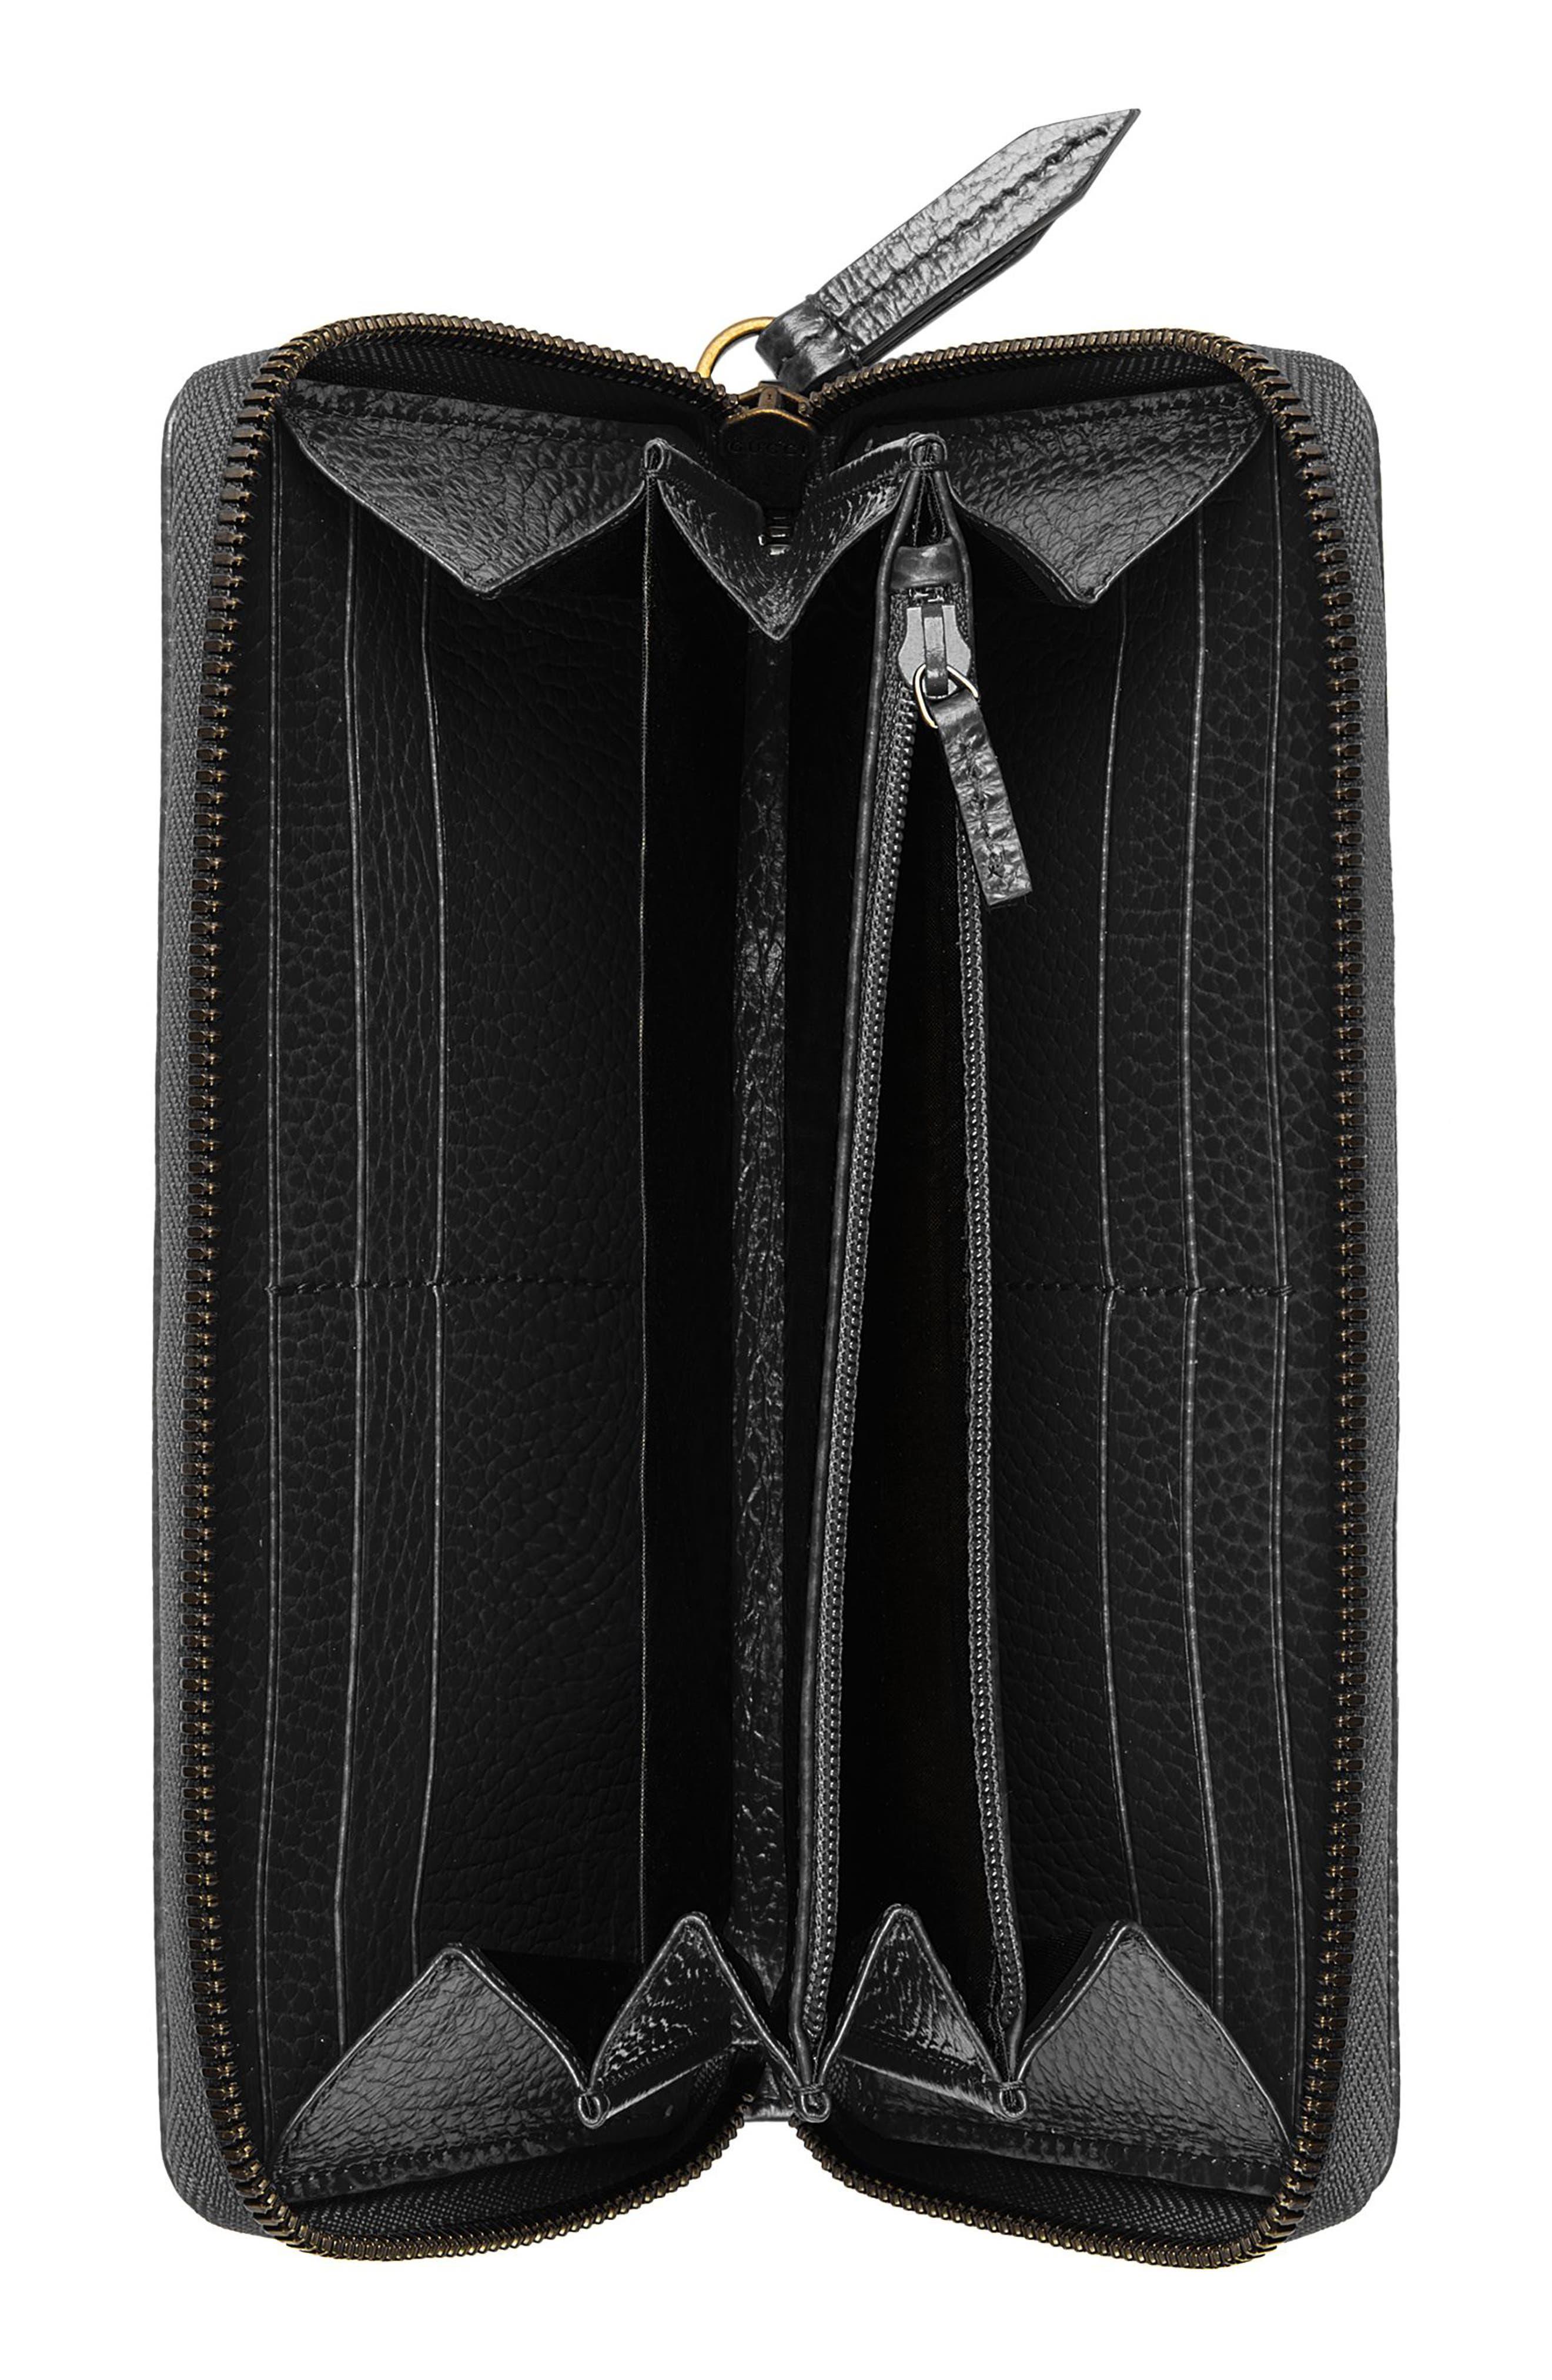 GUCCI, Farfalla Zip Around Leather Wallet, Alternate thumbnail 4, color, NERO/ CRYSTAL